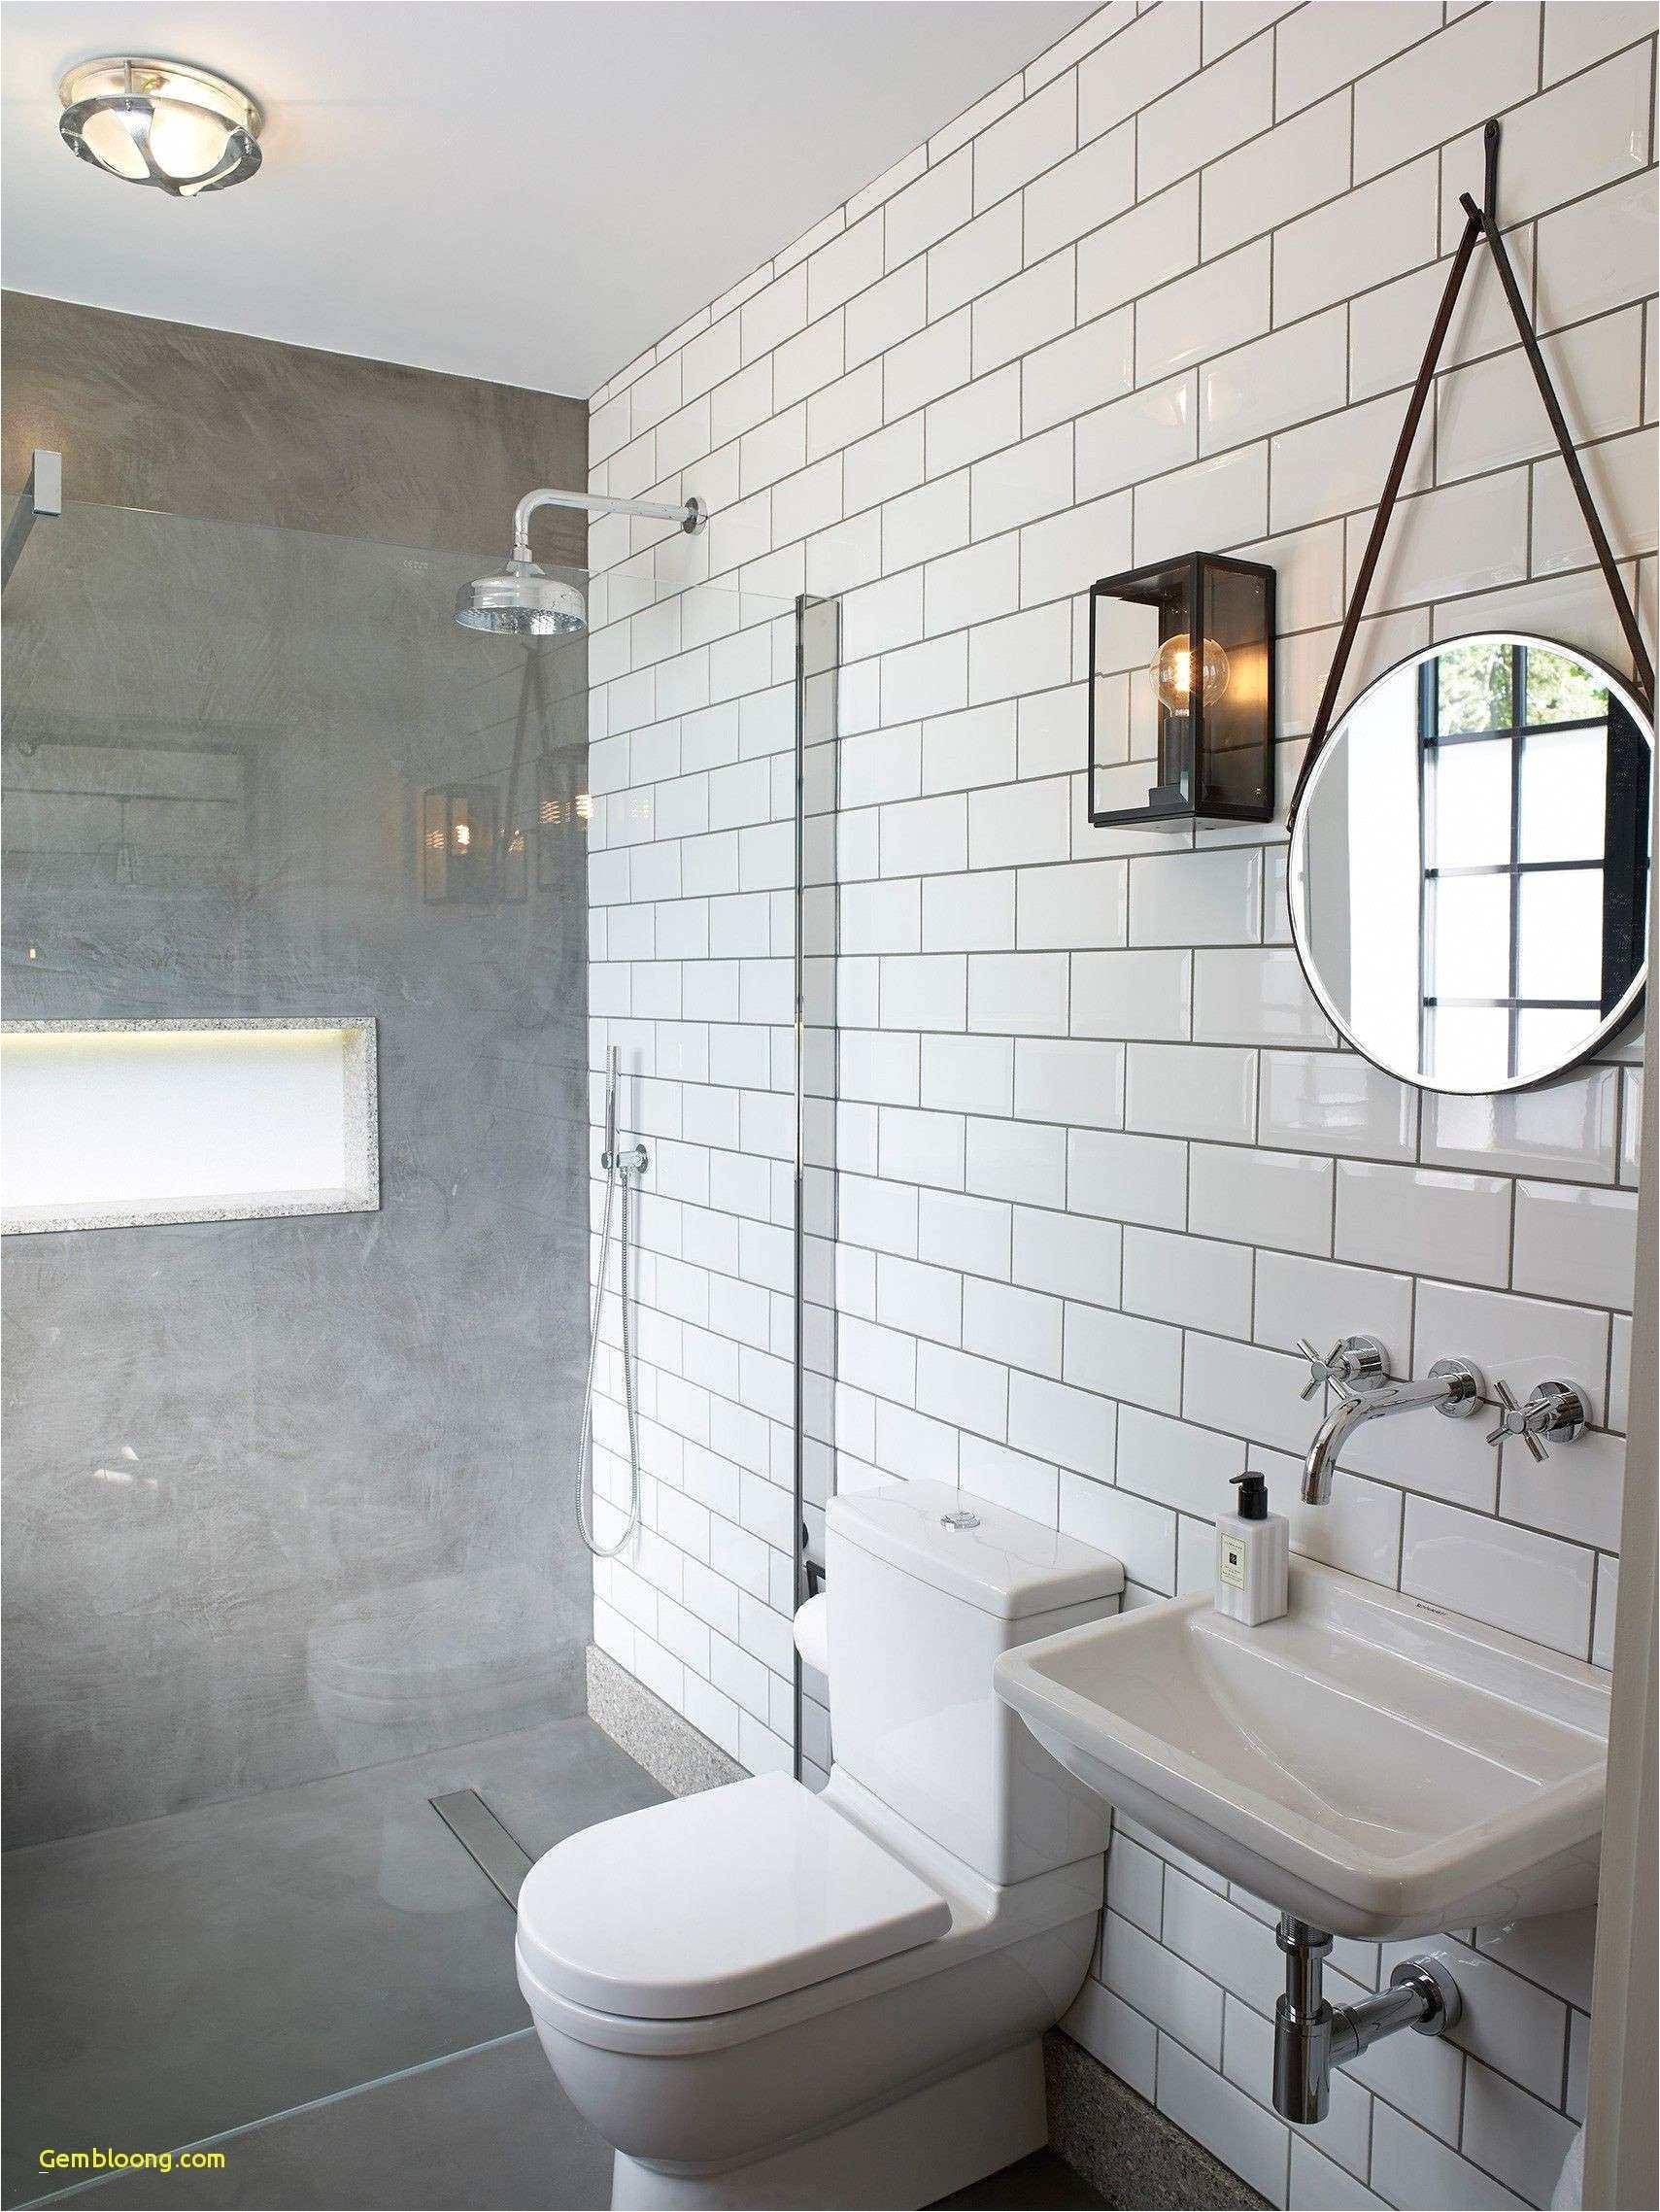 Retro Floor Tiles Bathroom Wall Decor Ideas Incredible Tag toilet Ideas 0d Mucsat In